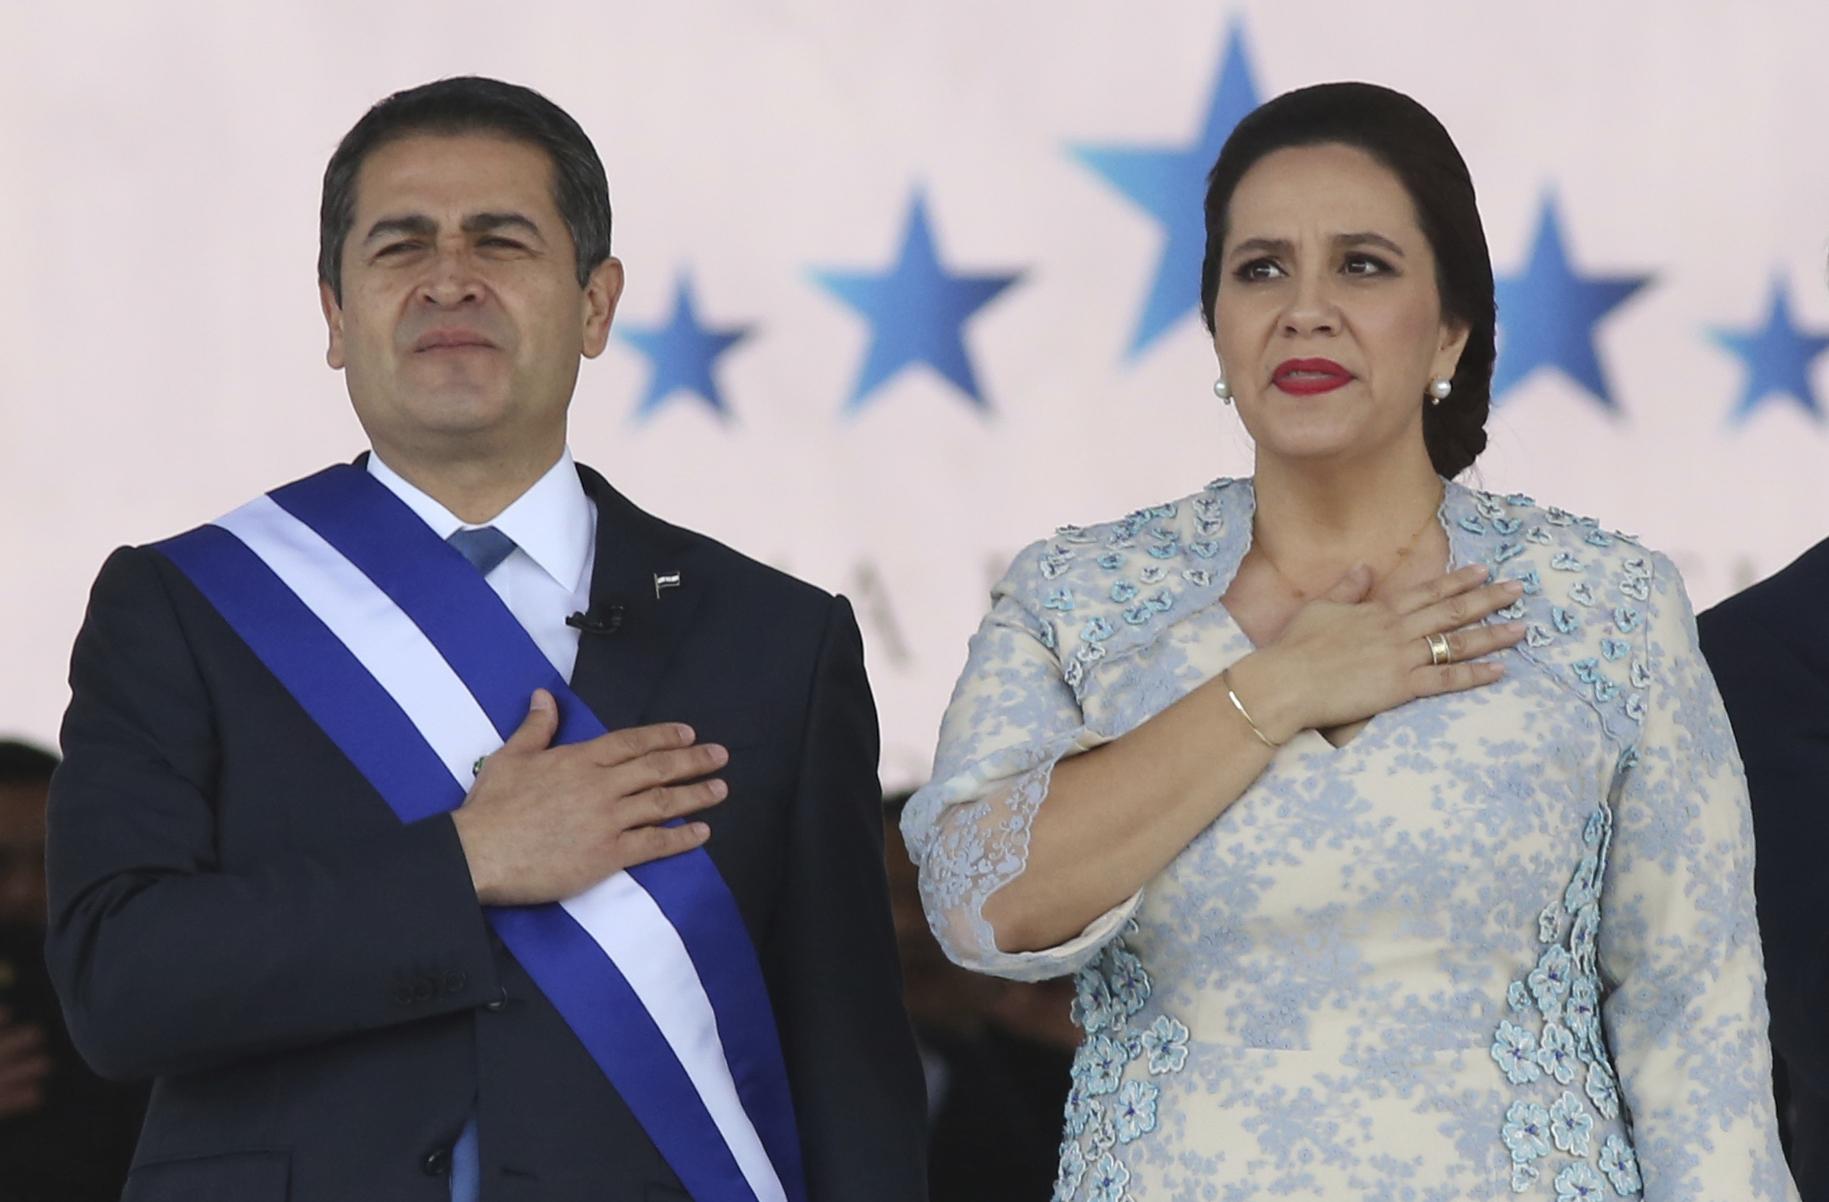 Juan Orlando Hernandez, Ana Garcia, Mauricio Oliva